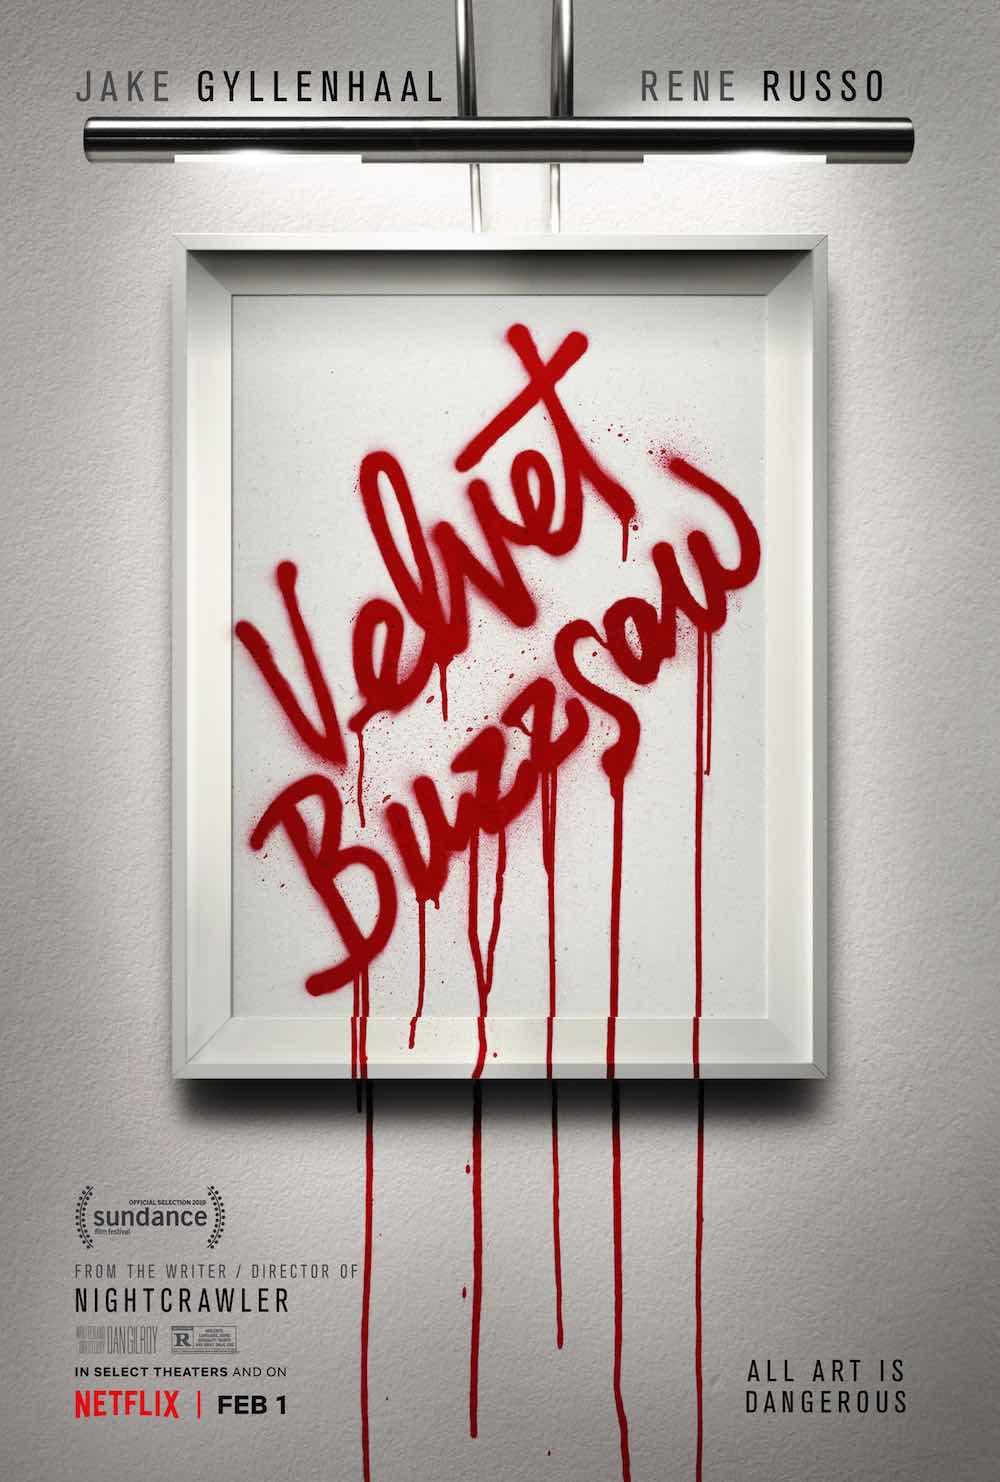 La locandina di Velvet Buzzsaw